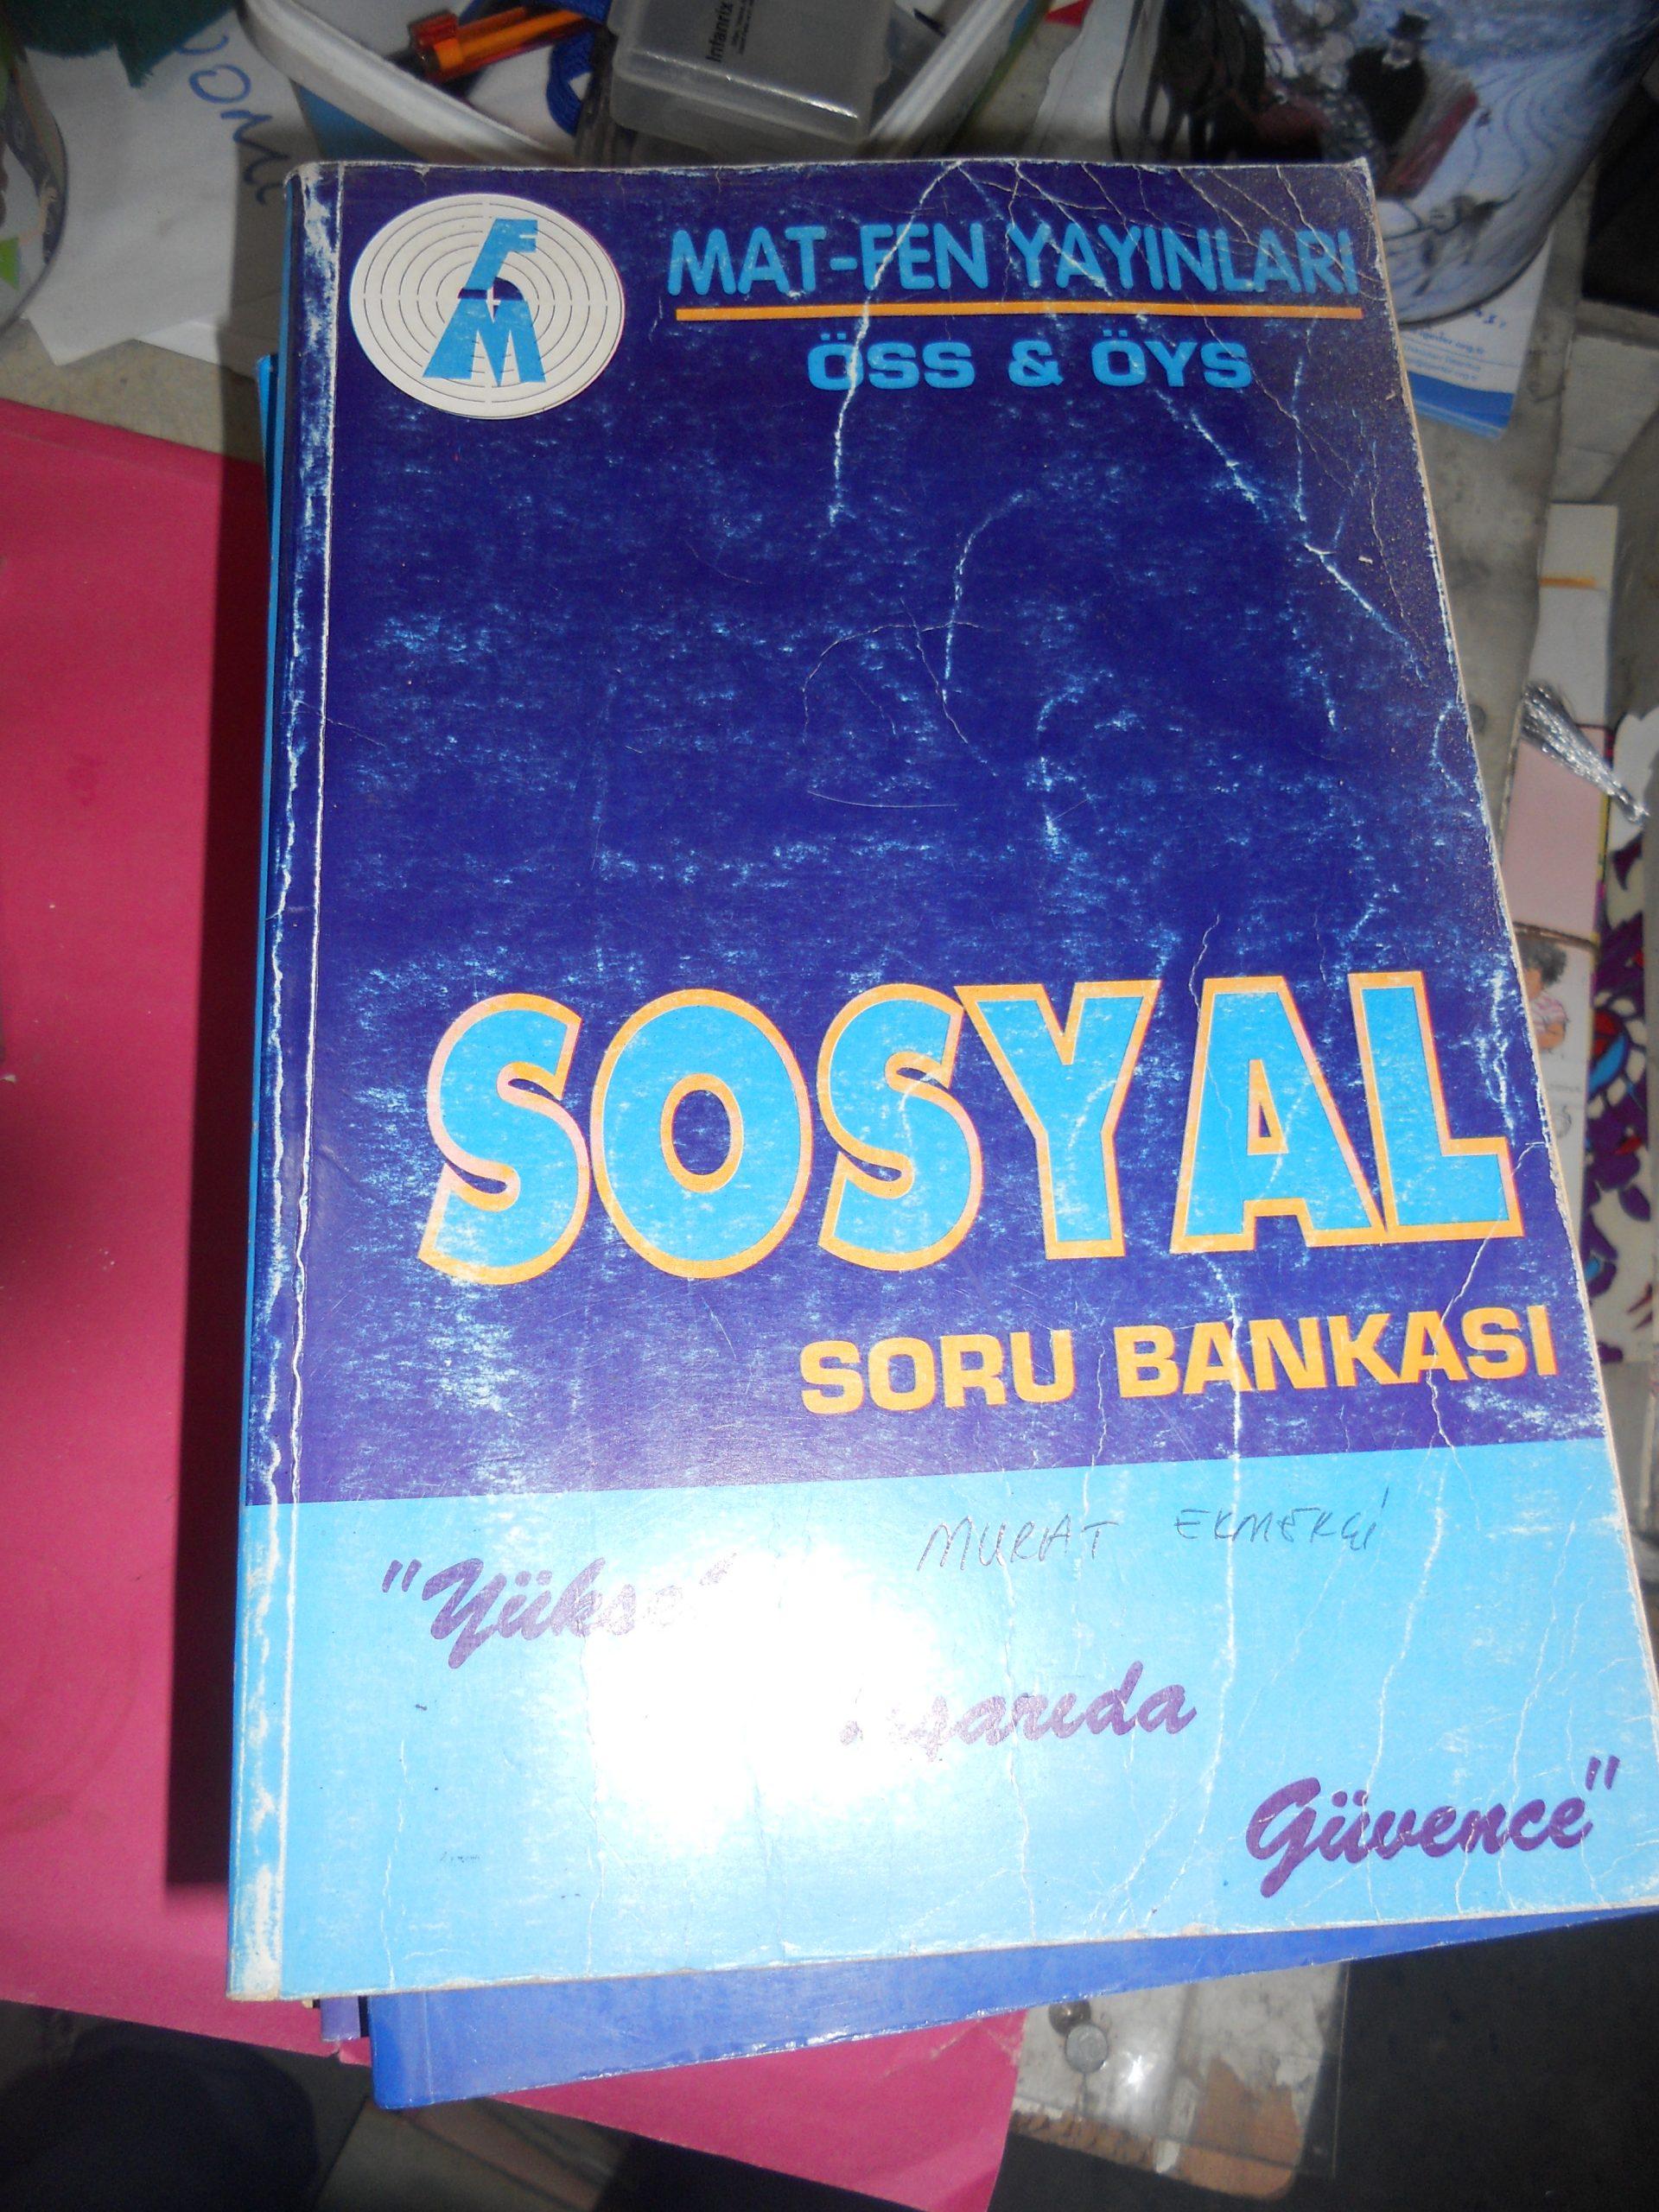 SOSYAL Soru Bankası-Mat-Fen yay/10 tl